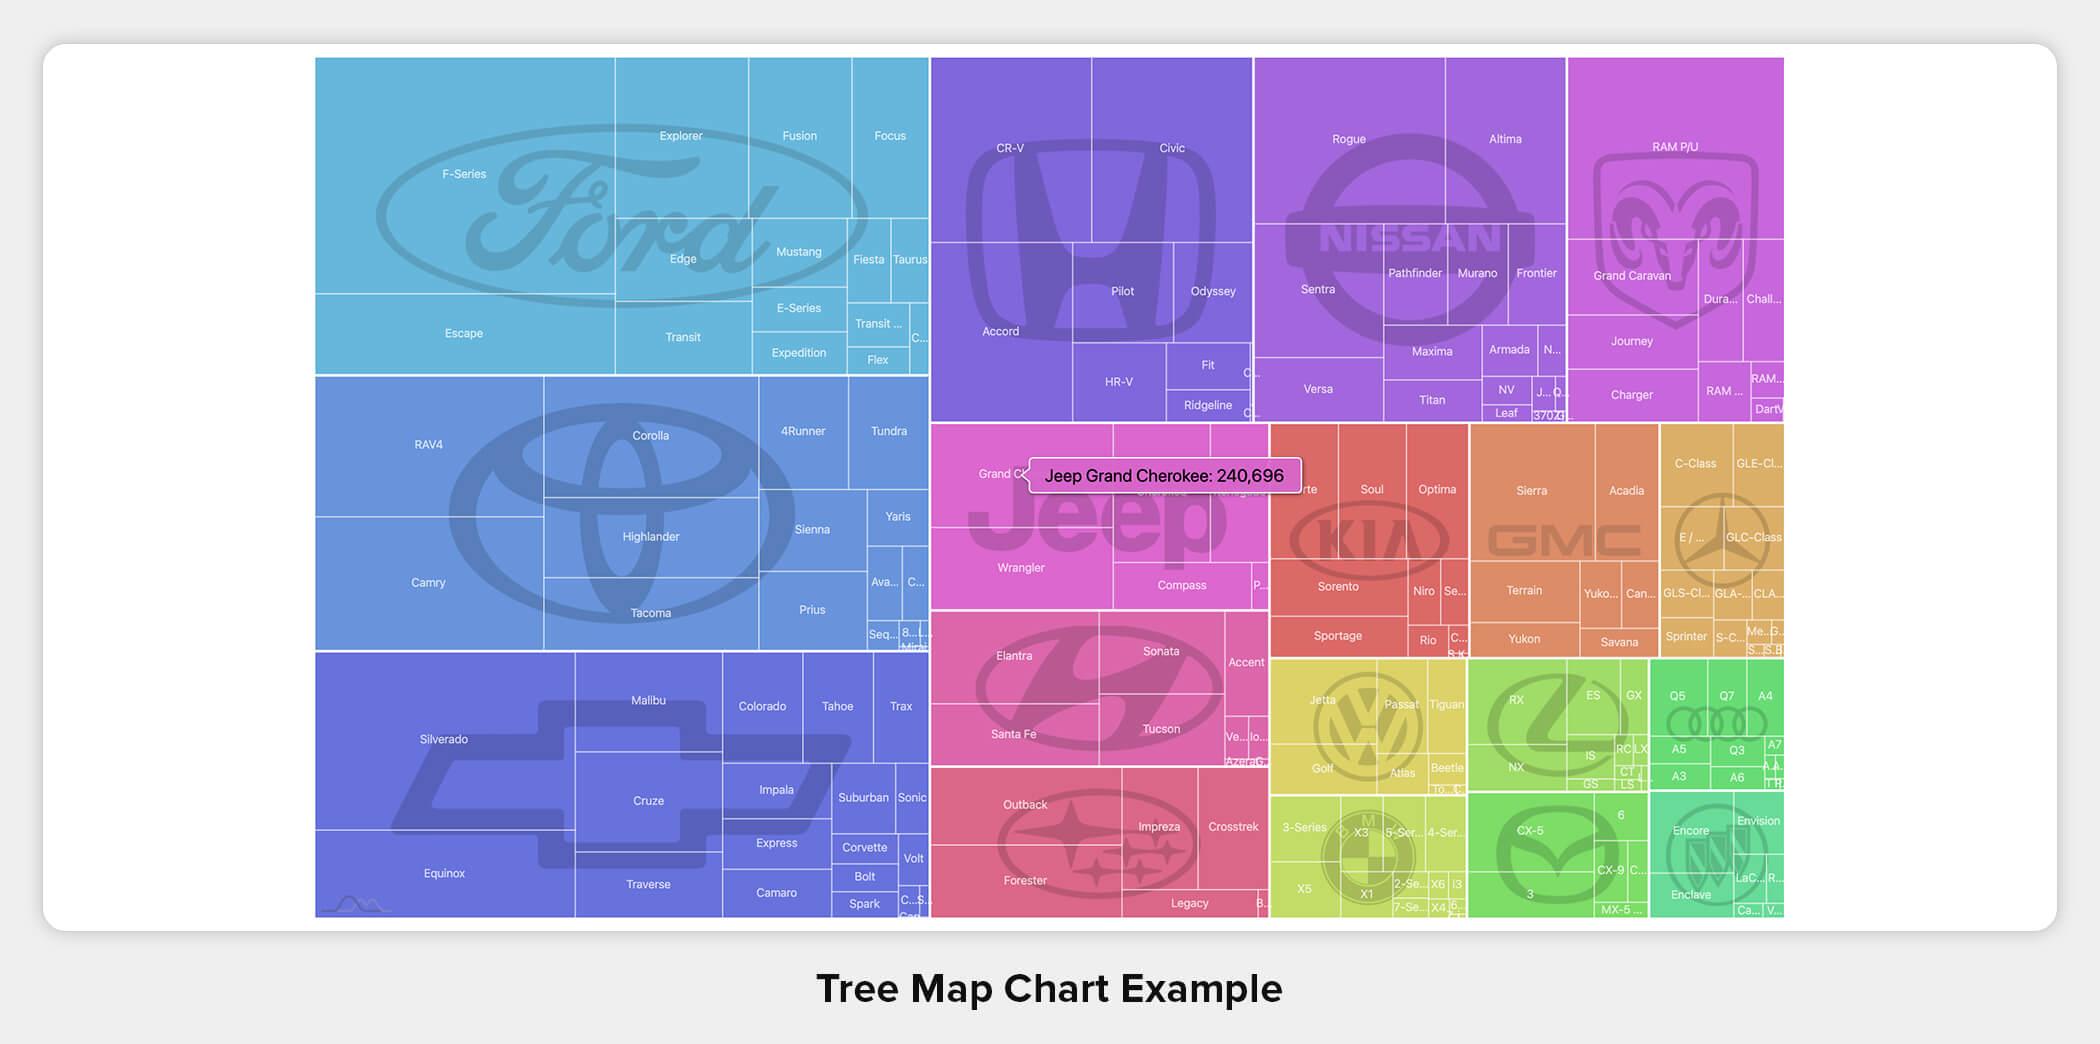 Tree Map Chart Example